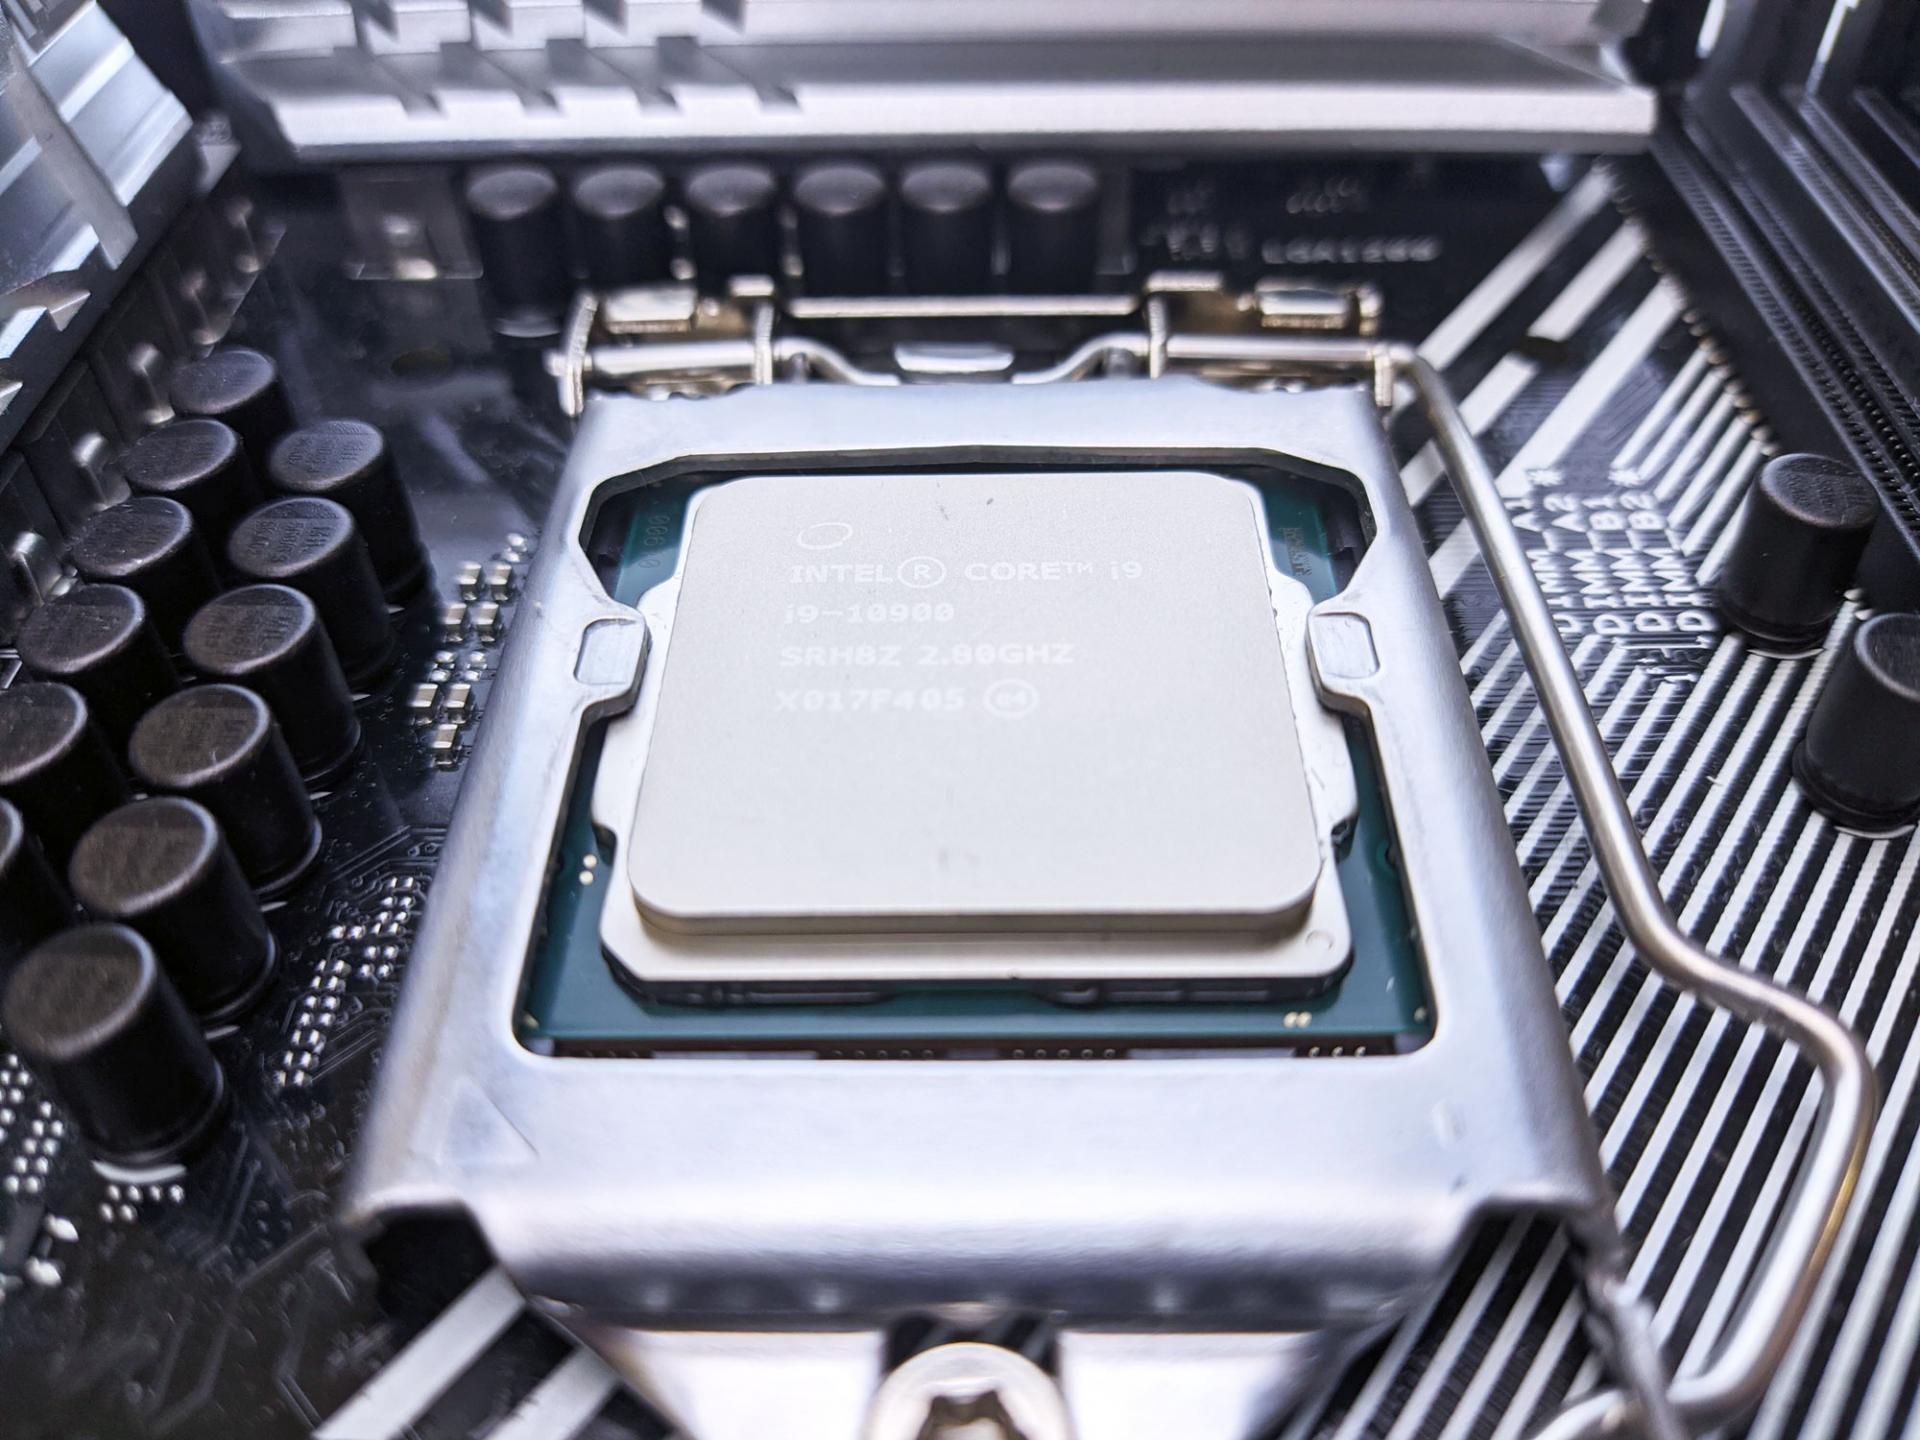 Тест-драйв процессора Intel Core i9-10900